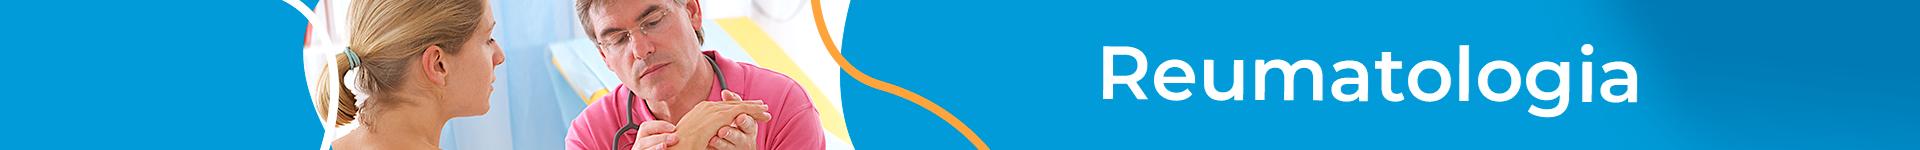 Banner - Reumatologia